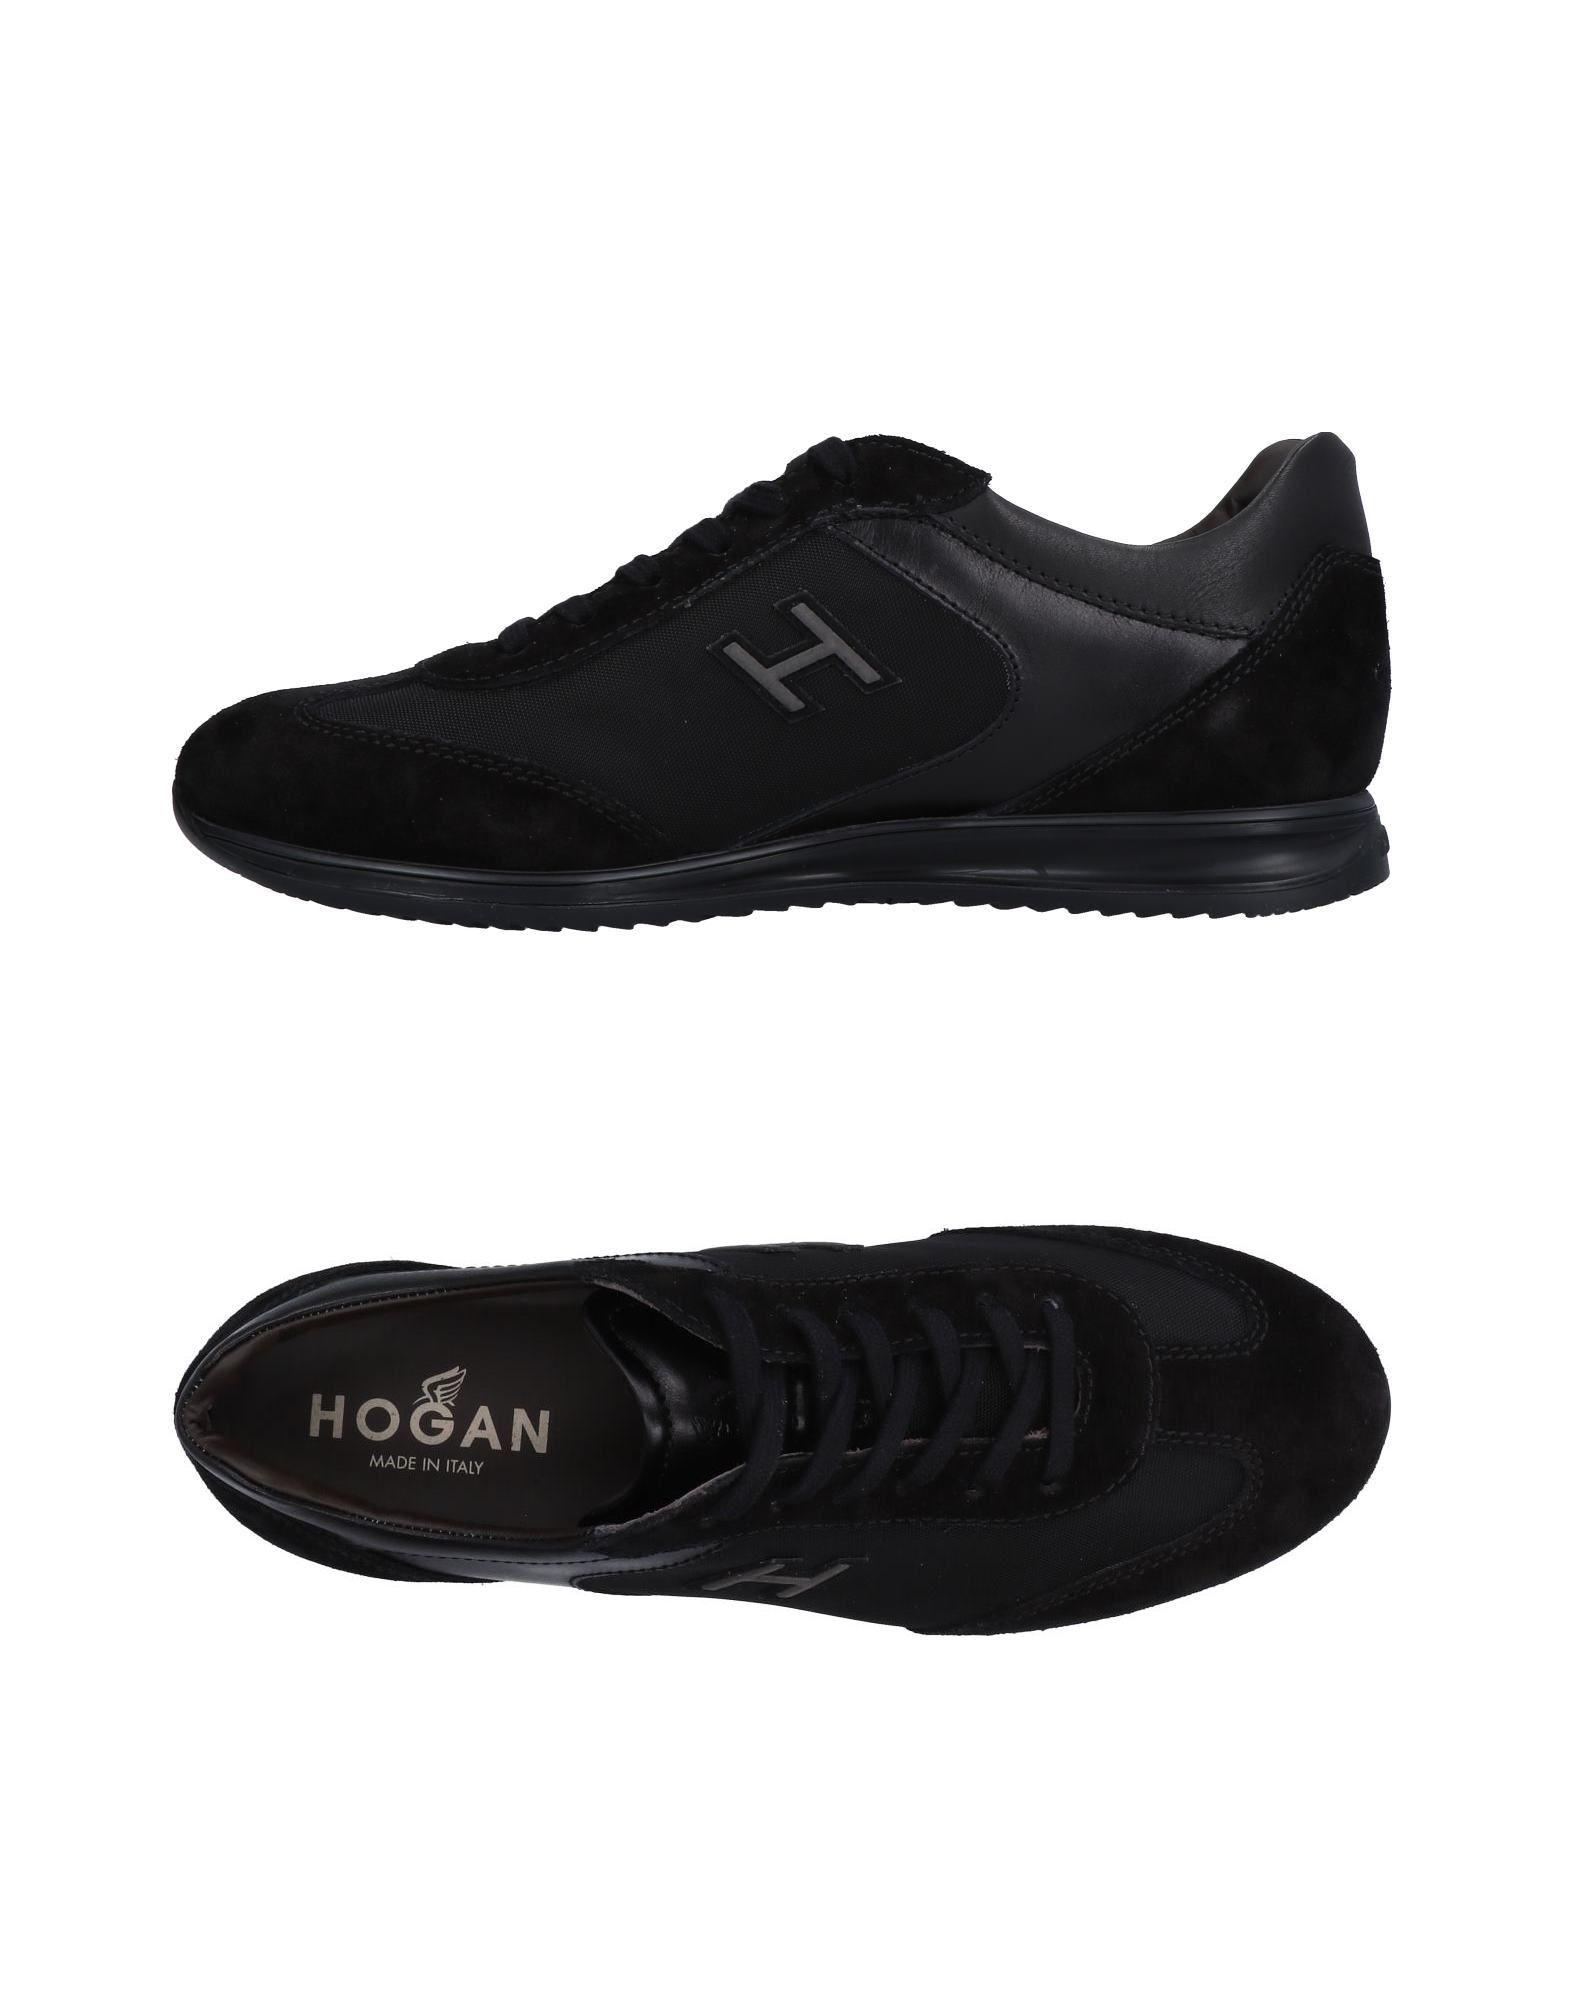 Hogan Sneakers Herren  11289264BX Gute Qualität beliebte Schuhe